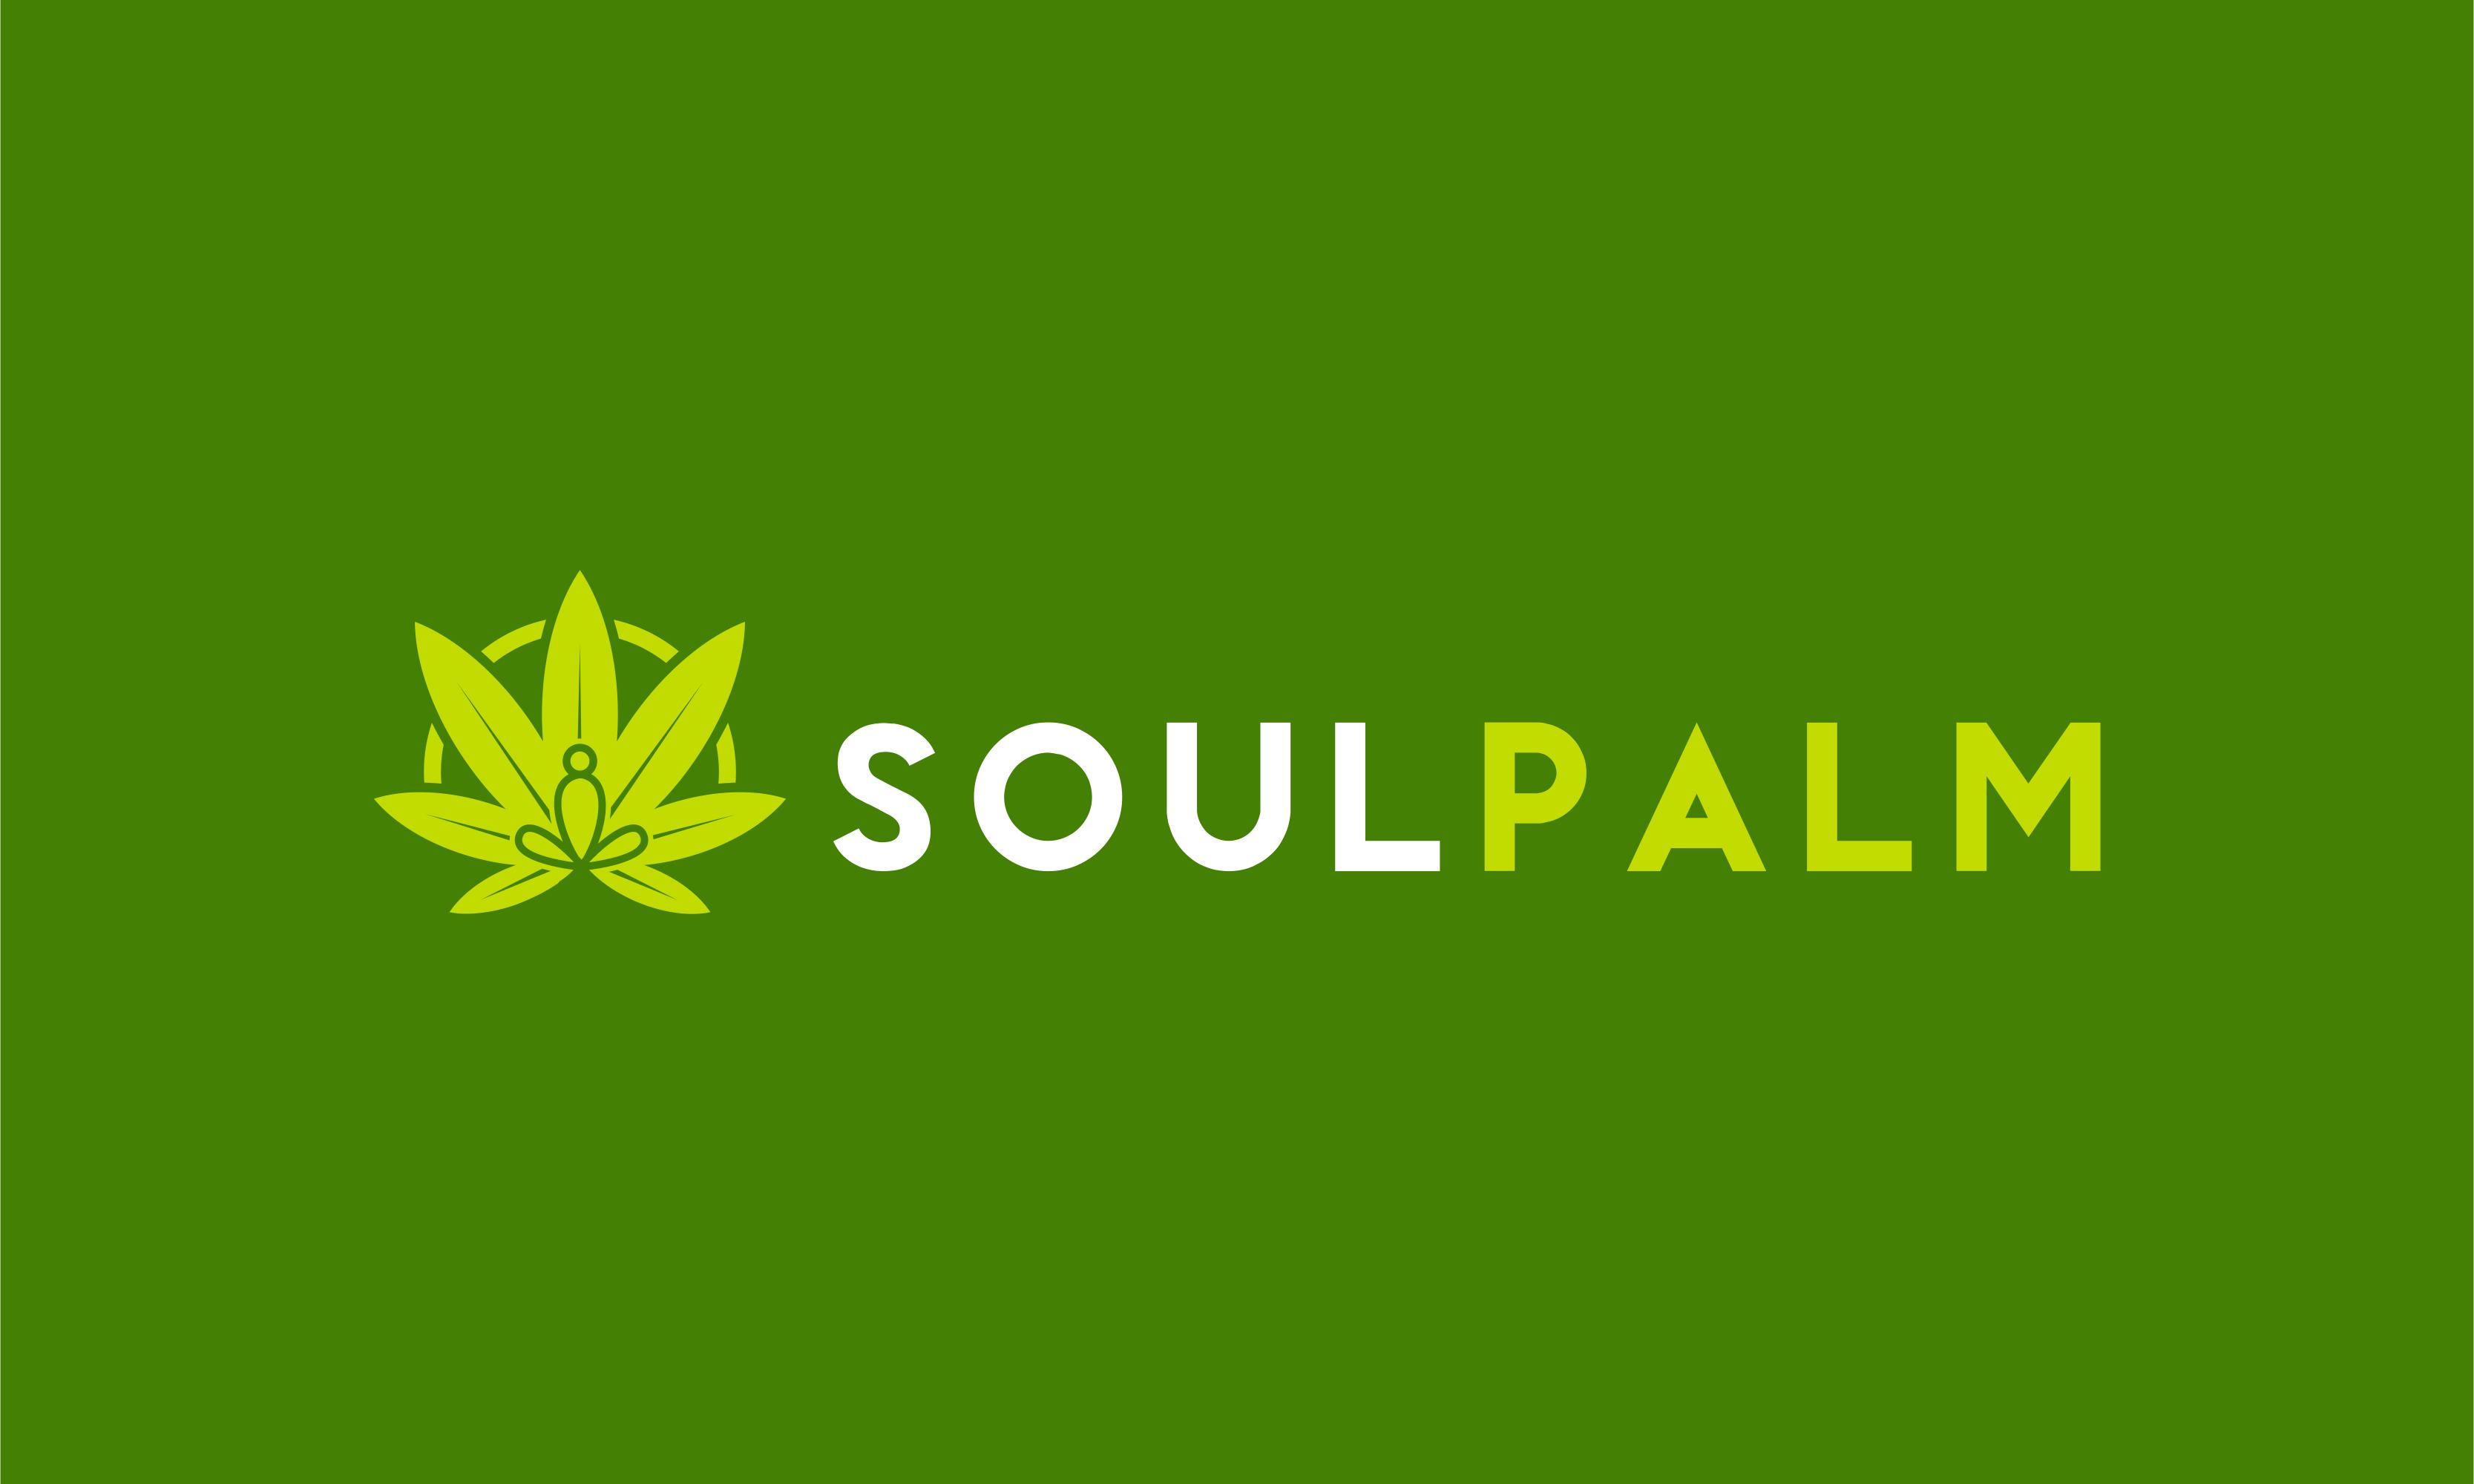 Soulpalm